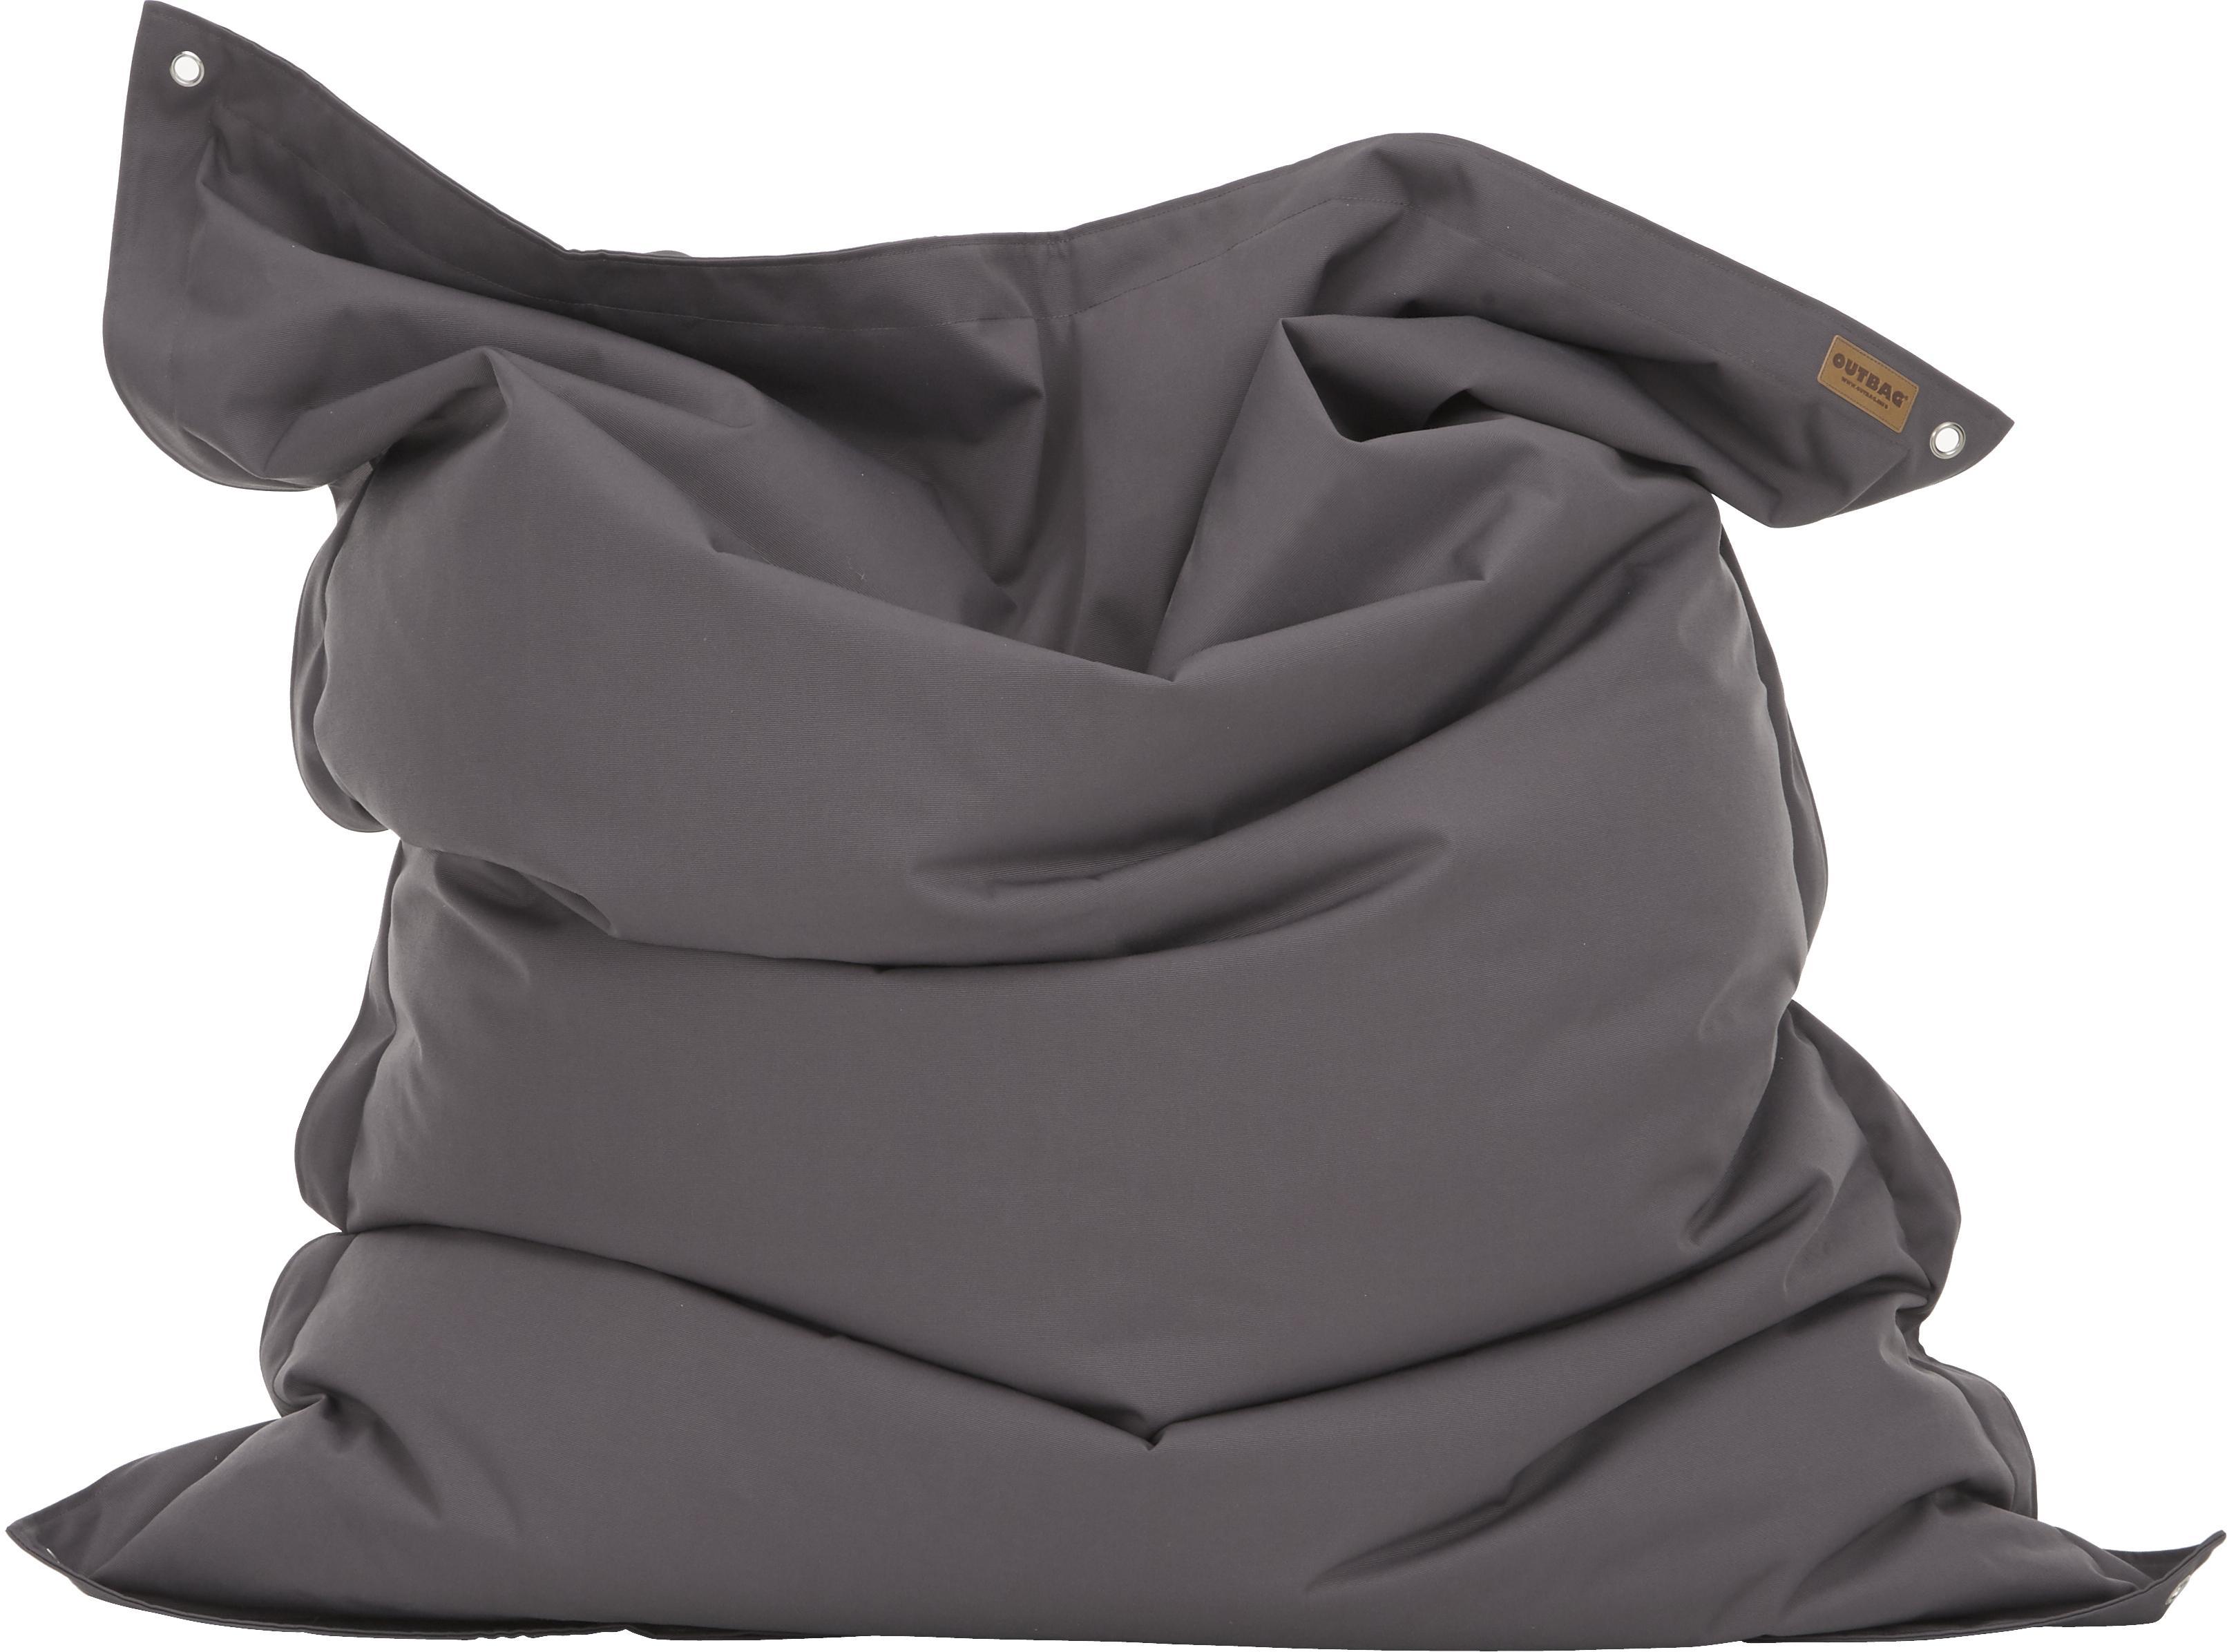 Grote zitzak Meadow, Bekleding: polyester, polyurethaan g, Antraciet, 130 x 160 cm